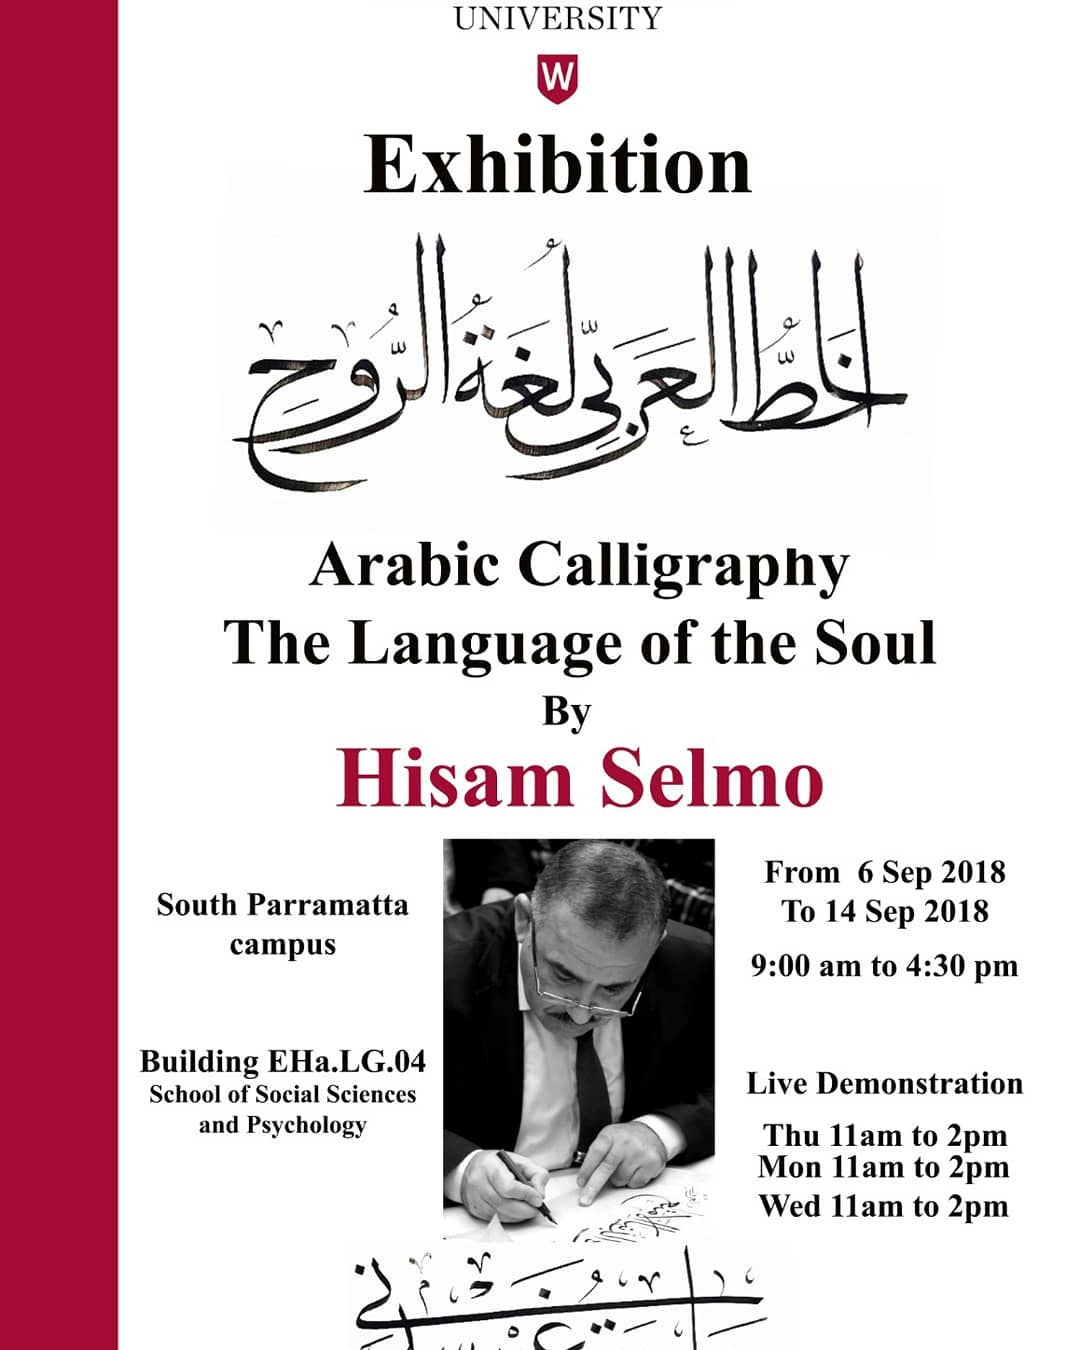 Works Calligraphy Haythamsalmo بسم الله الرحمن الرحيم سيتم باذنه تعالى افتتاح معرضي الشخصي في جامعة ويسترن سدني… 246